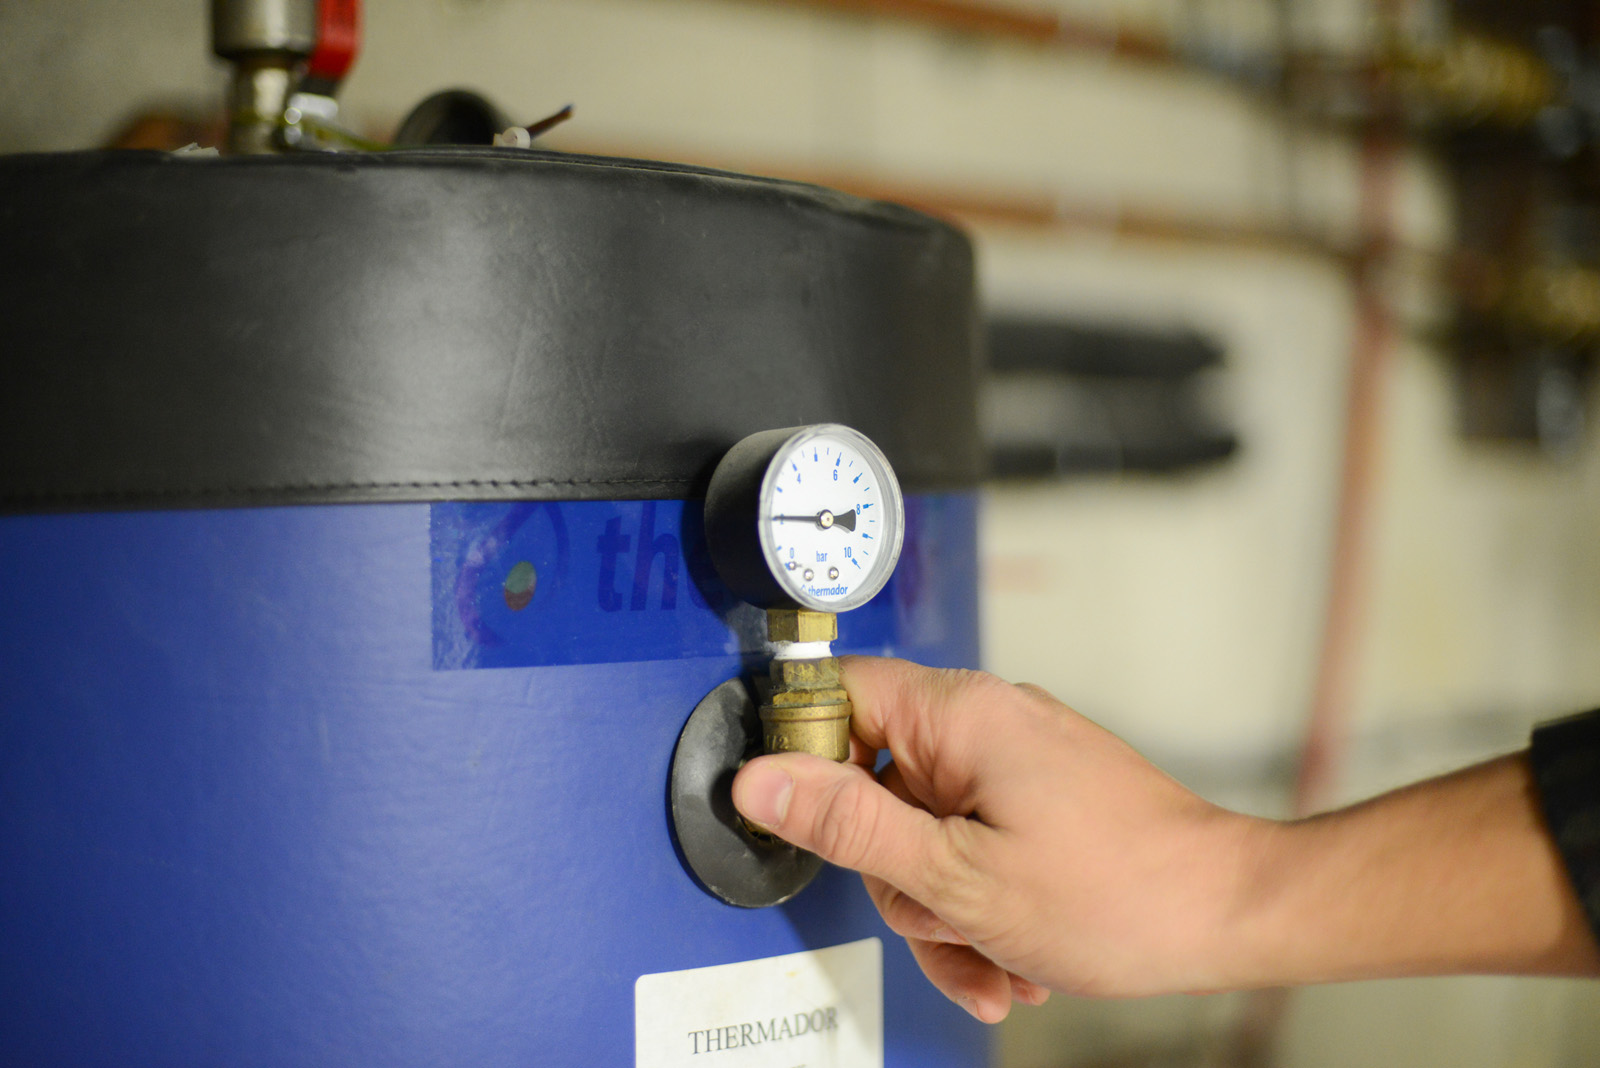 SARL Mora, chauffage, climatisation, plomberie, sanitaire dans l'Hérault